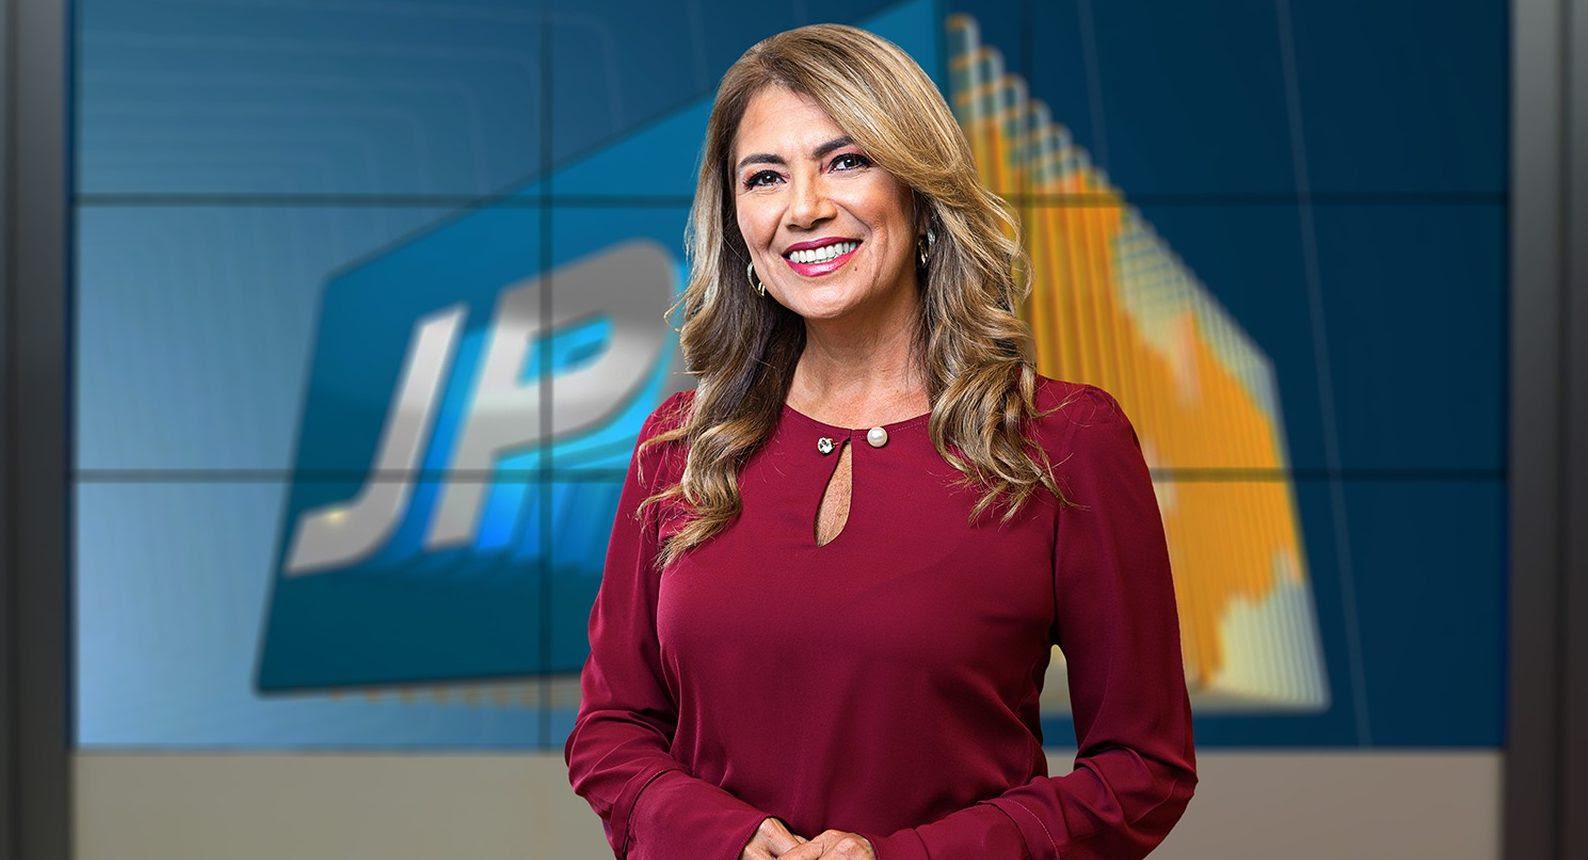 Edilane Araújo deixa bancada do JPB 2ª Edição da TV Cabo Branco